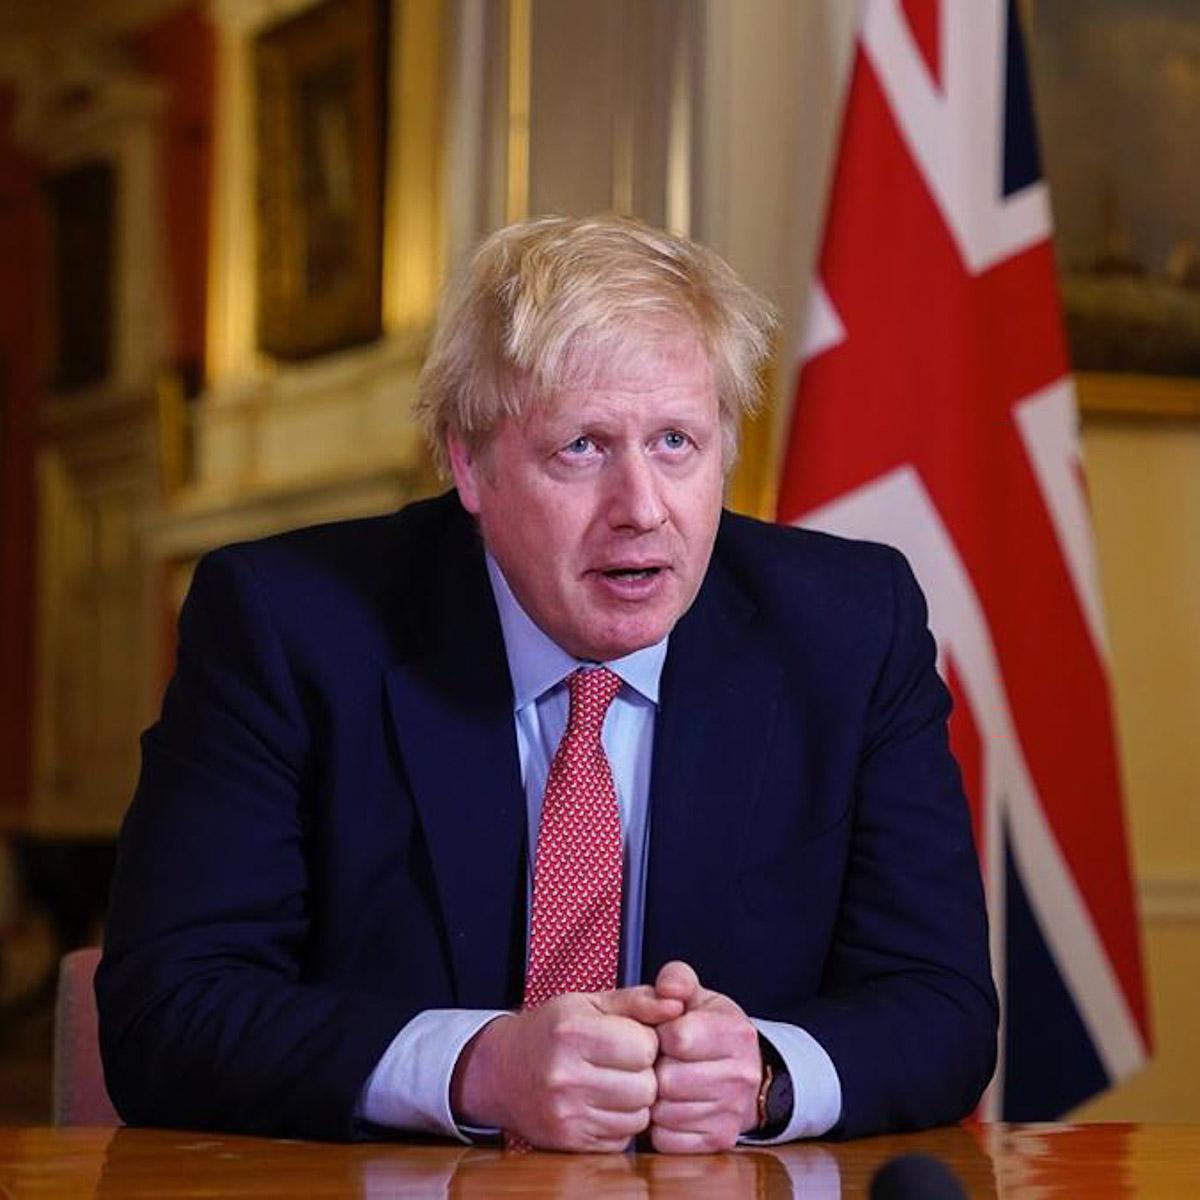 boris-johnson-uk-prime-minister-hair-loss-grooming-hairstyle-man-for-himself